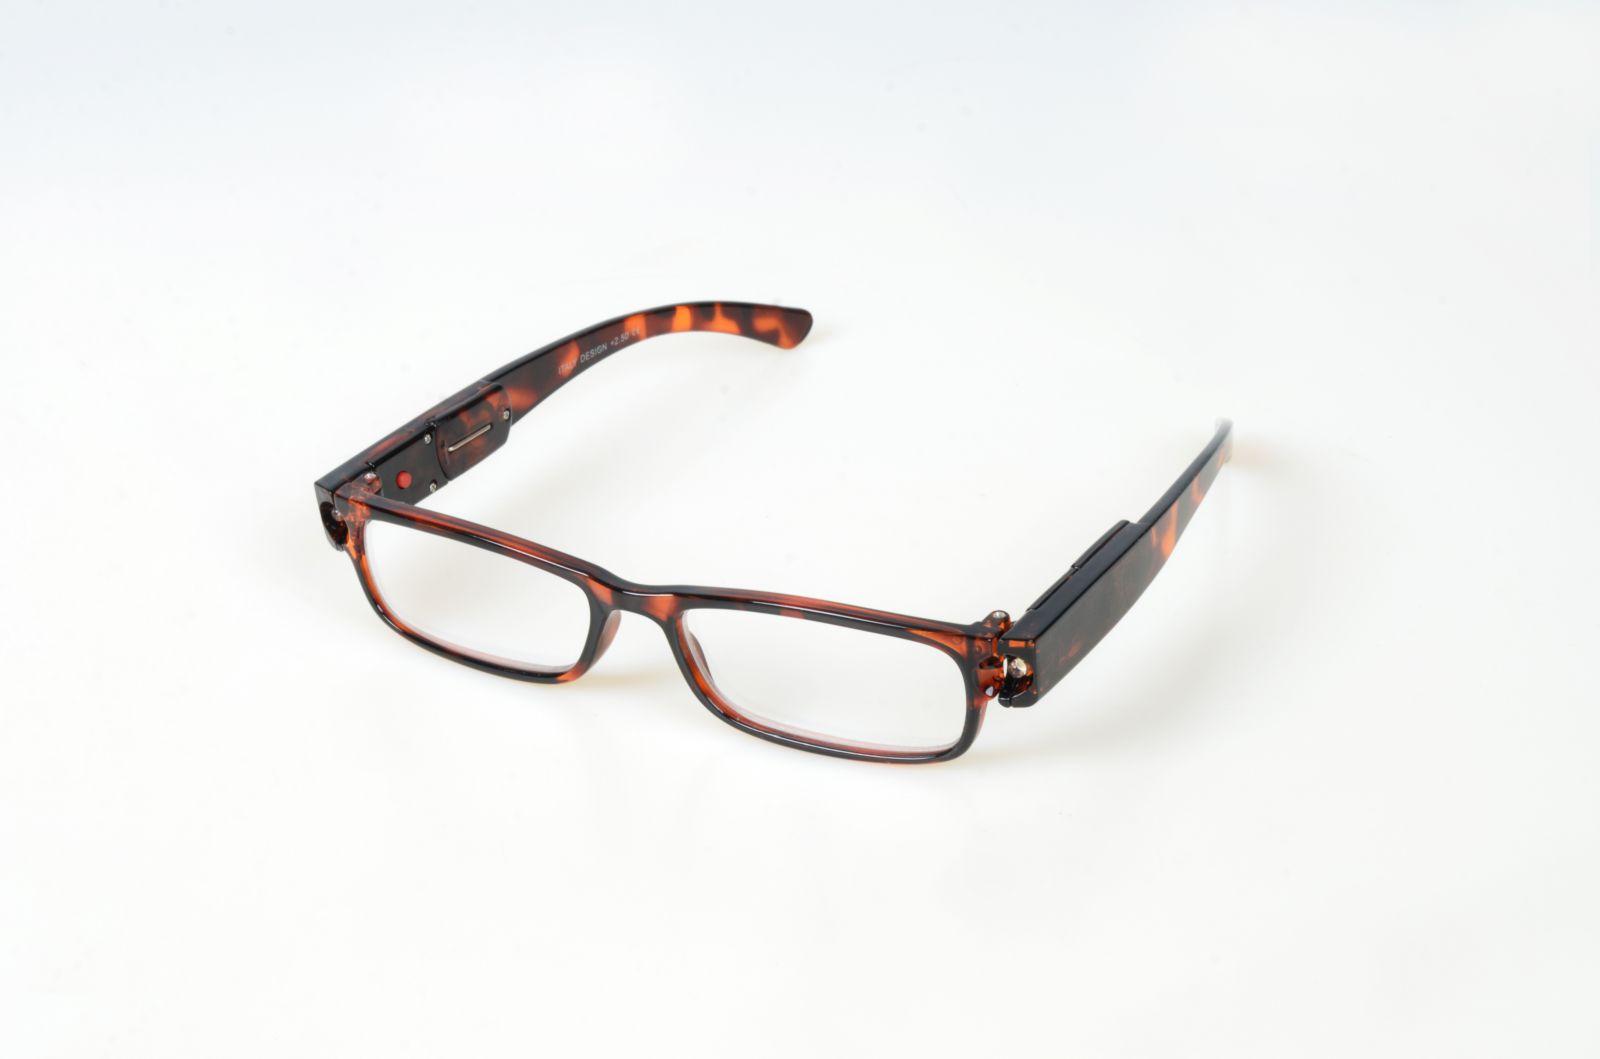 Dioptrické brýle se světýlkama +4,00